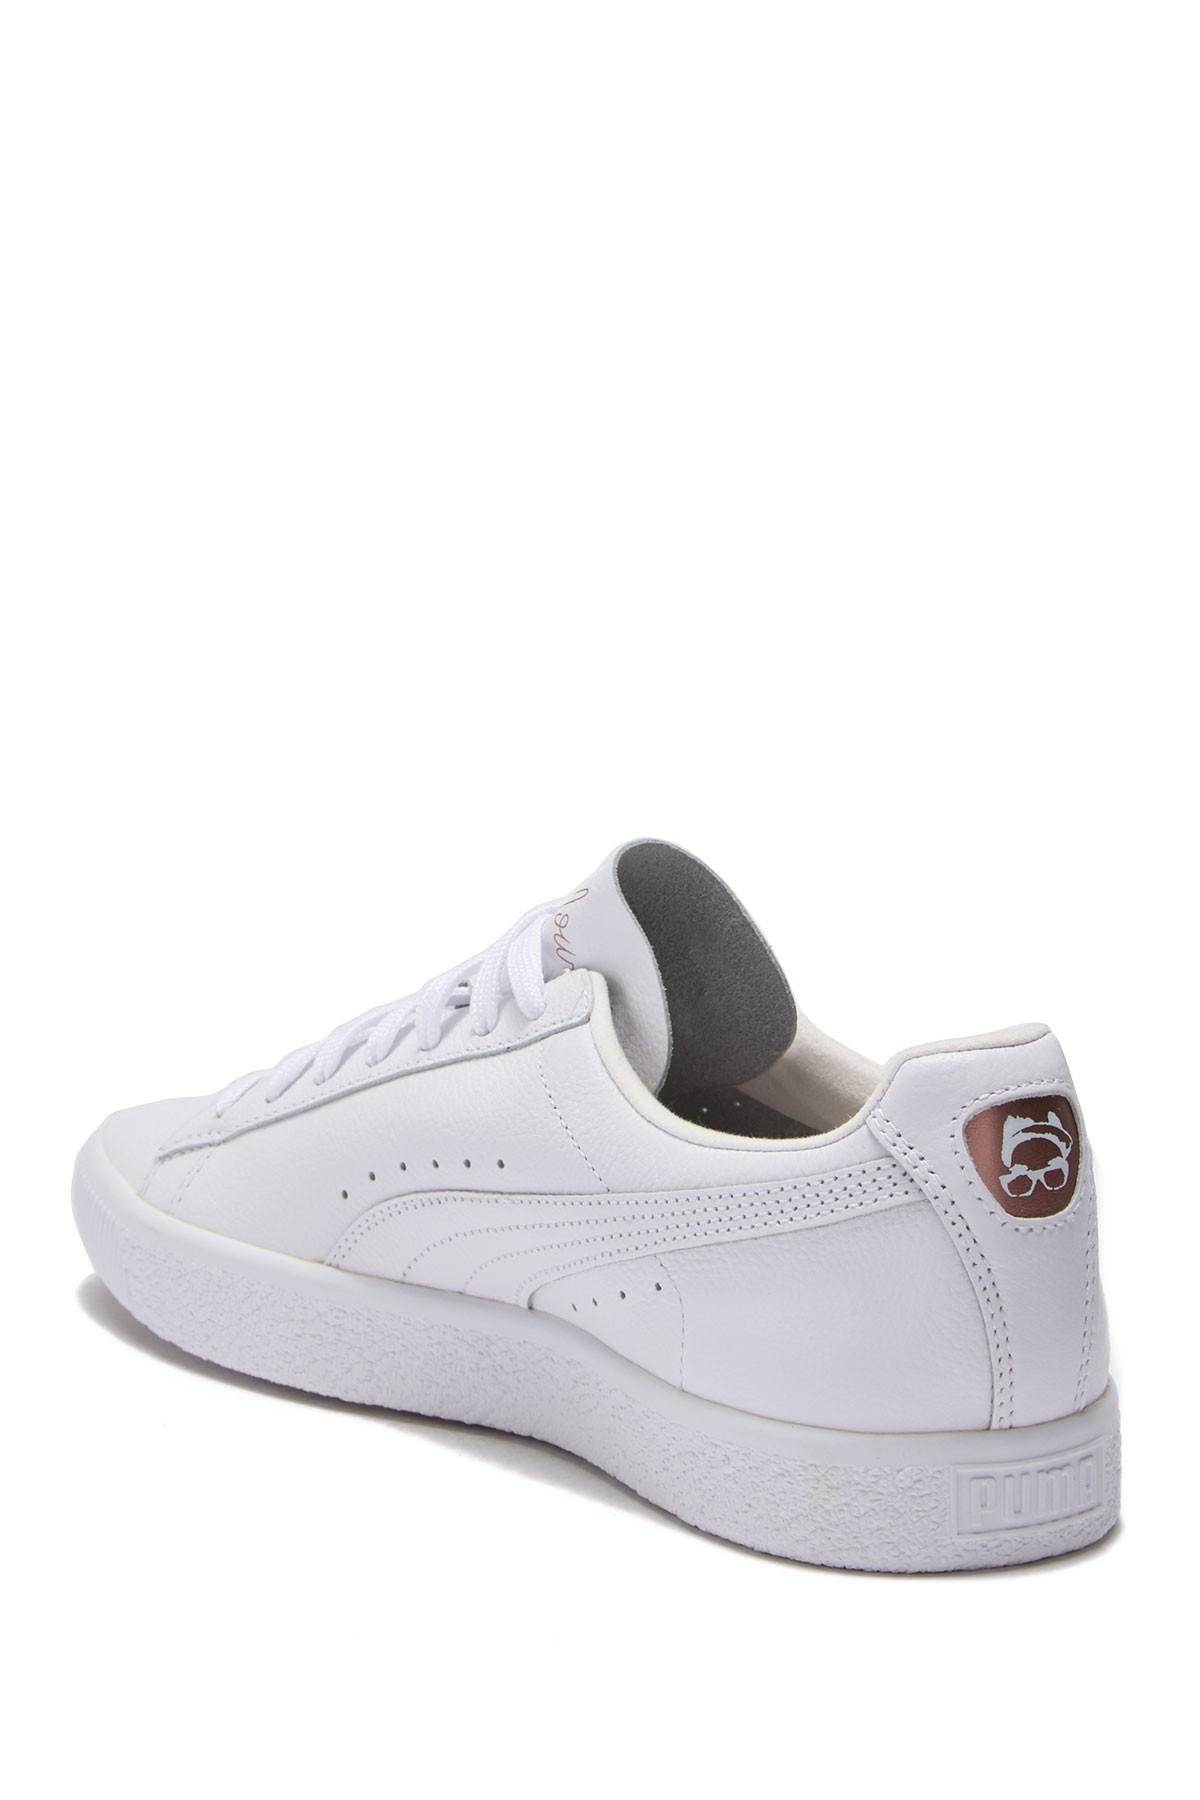 super popular 78fde 6b6c6 PUMA White Clyde X Emory Jones Sneaker for men